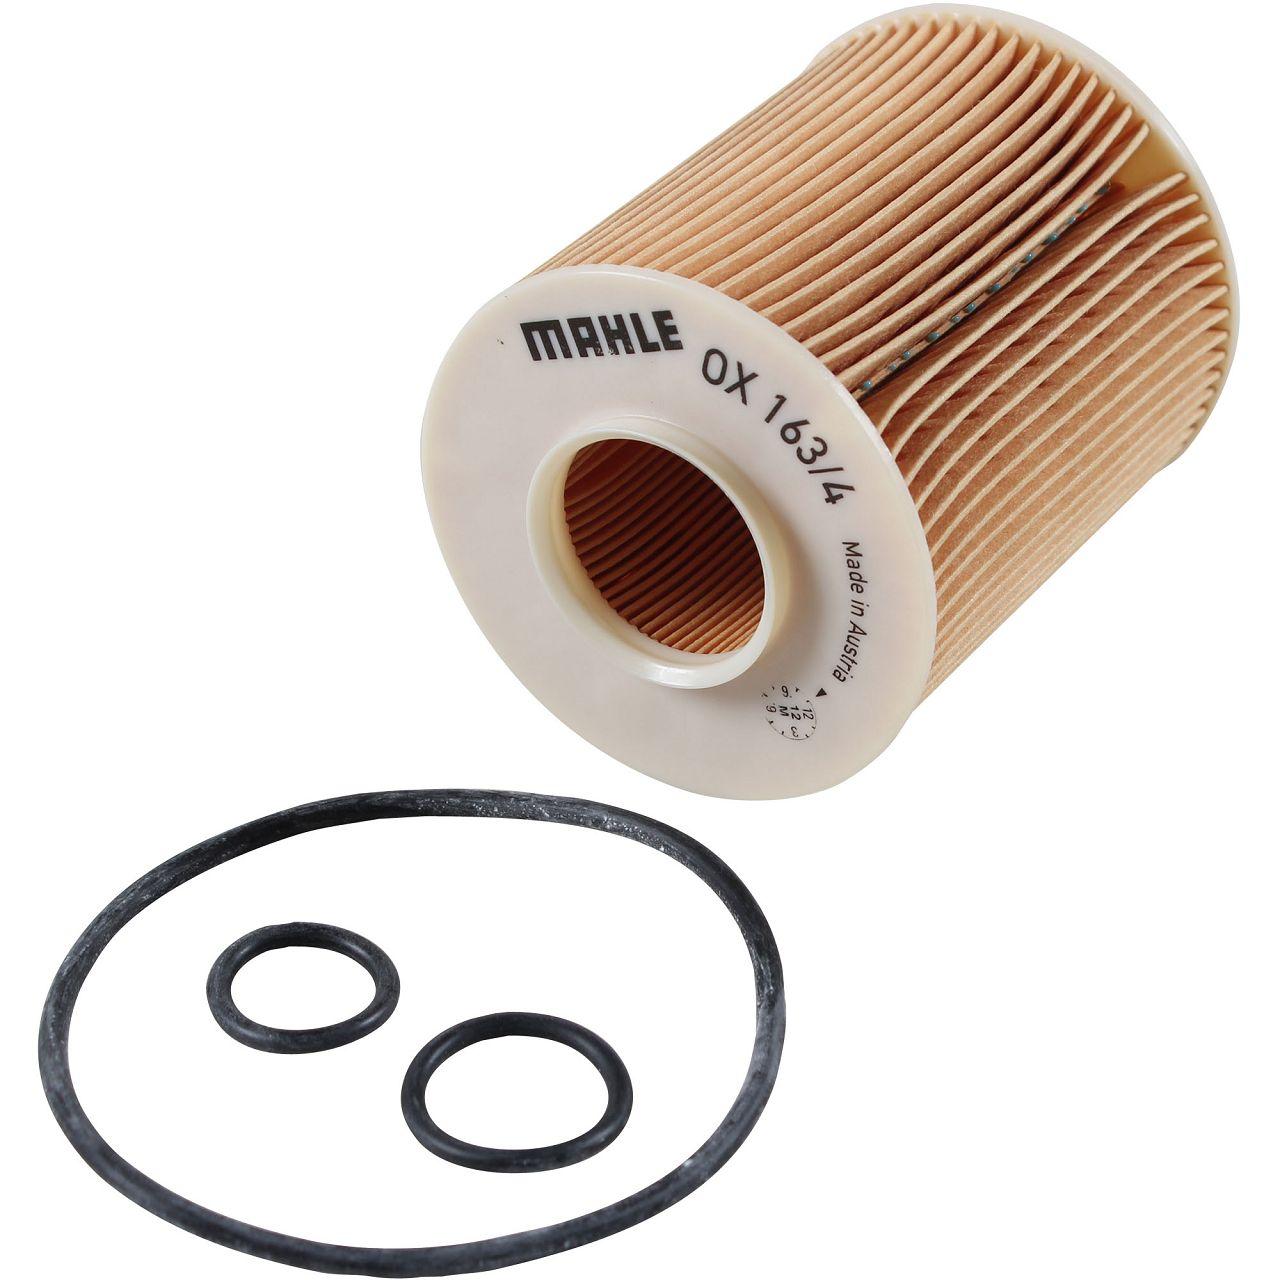 Filterpaket Filterset für Opel Combo Corsa C 1.7DTI 1.7CDTI 75/101 PS